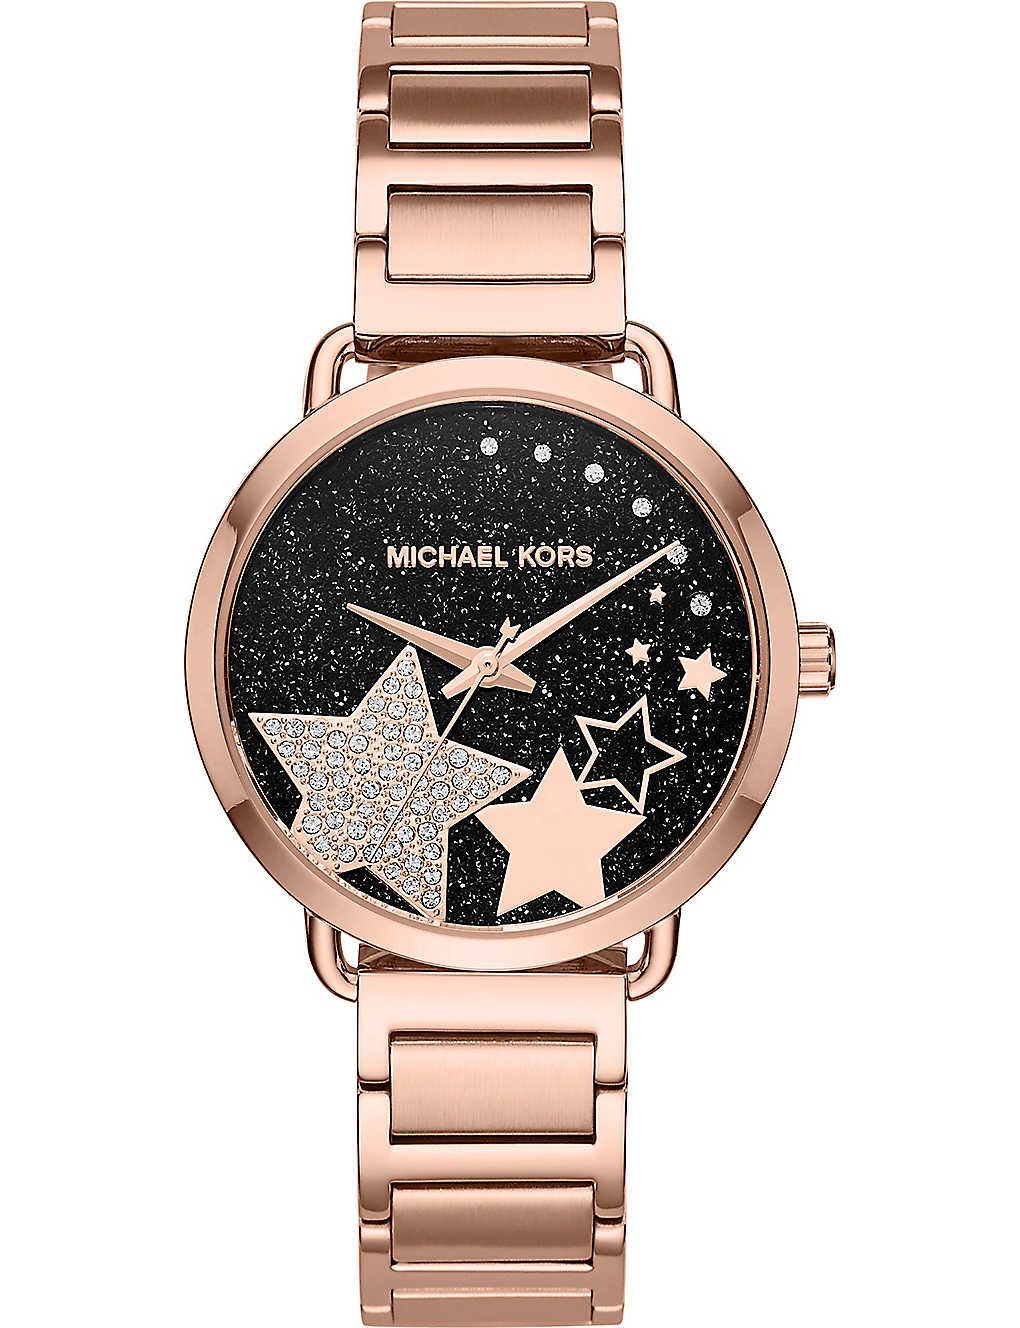 ac6d2efe3474 MICHAEL KORS - MK3795 Portia rose-gold stainless steel quartz watch ...